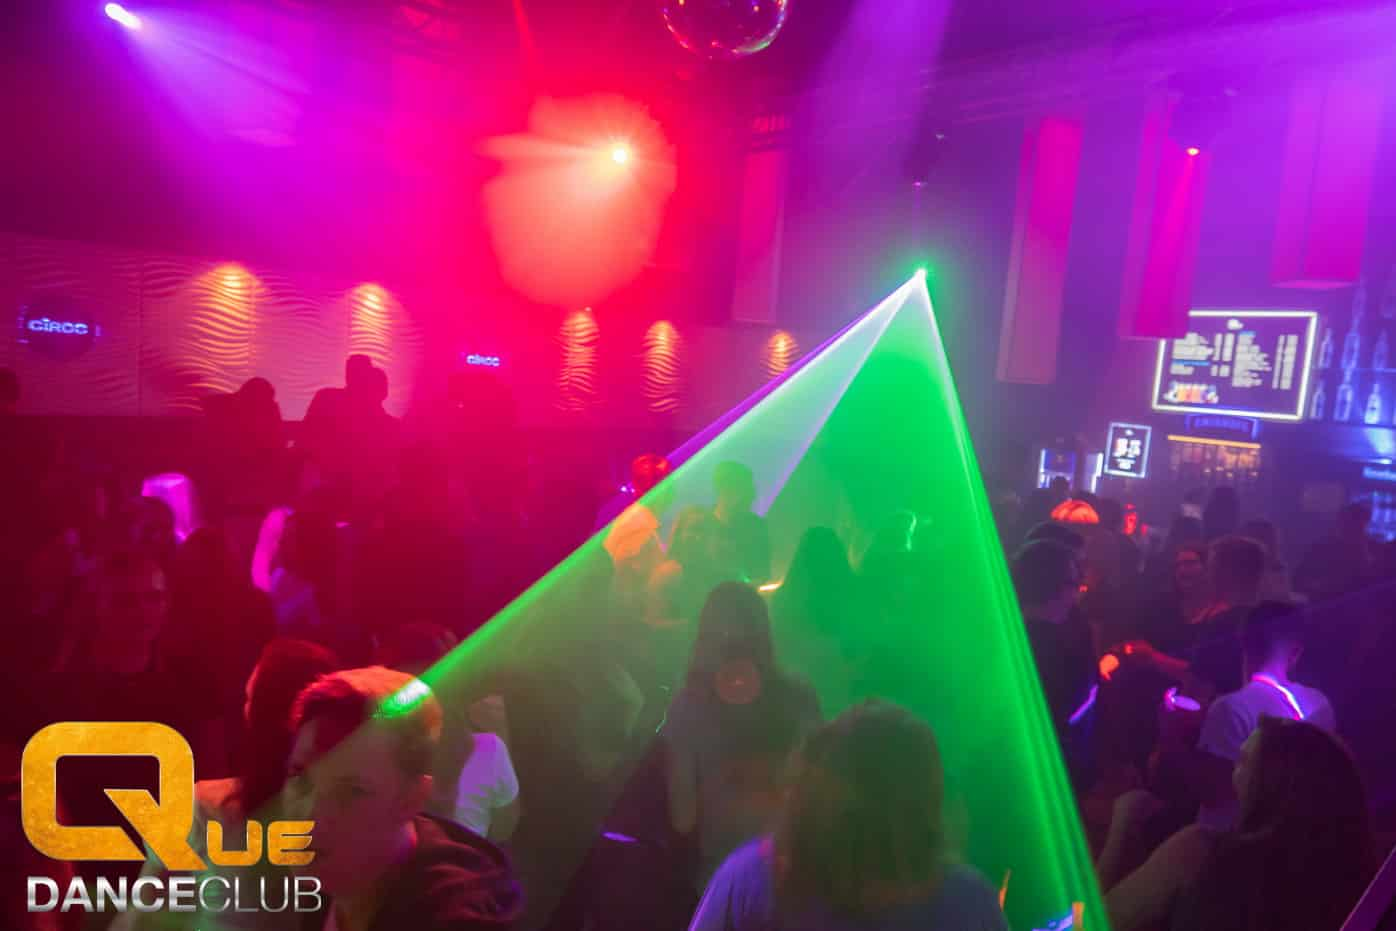 2018_11_23_Que_Danceclub_BLCK_FRDY_United_Nightlife_Scene_Timo_016